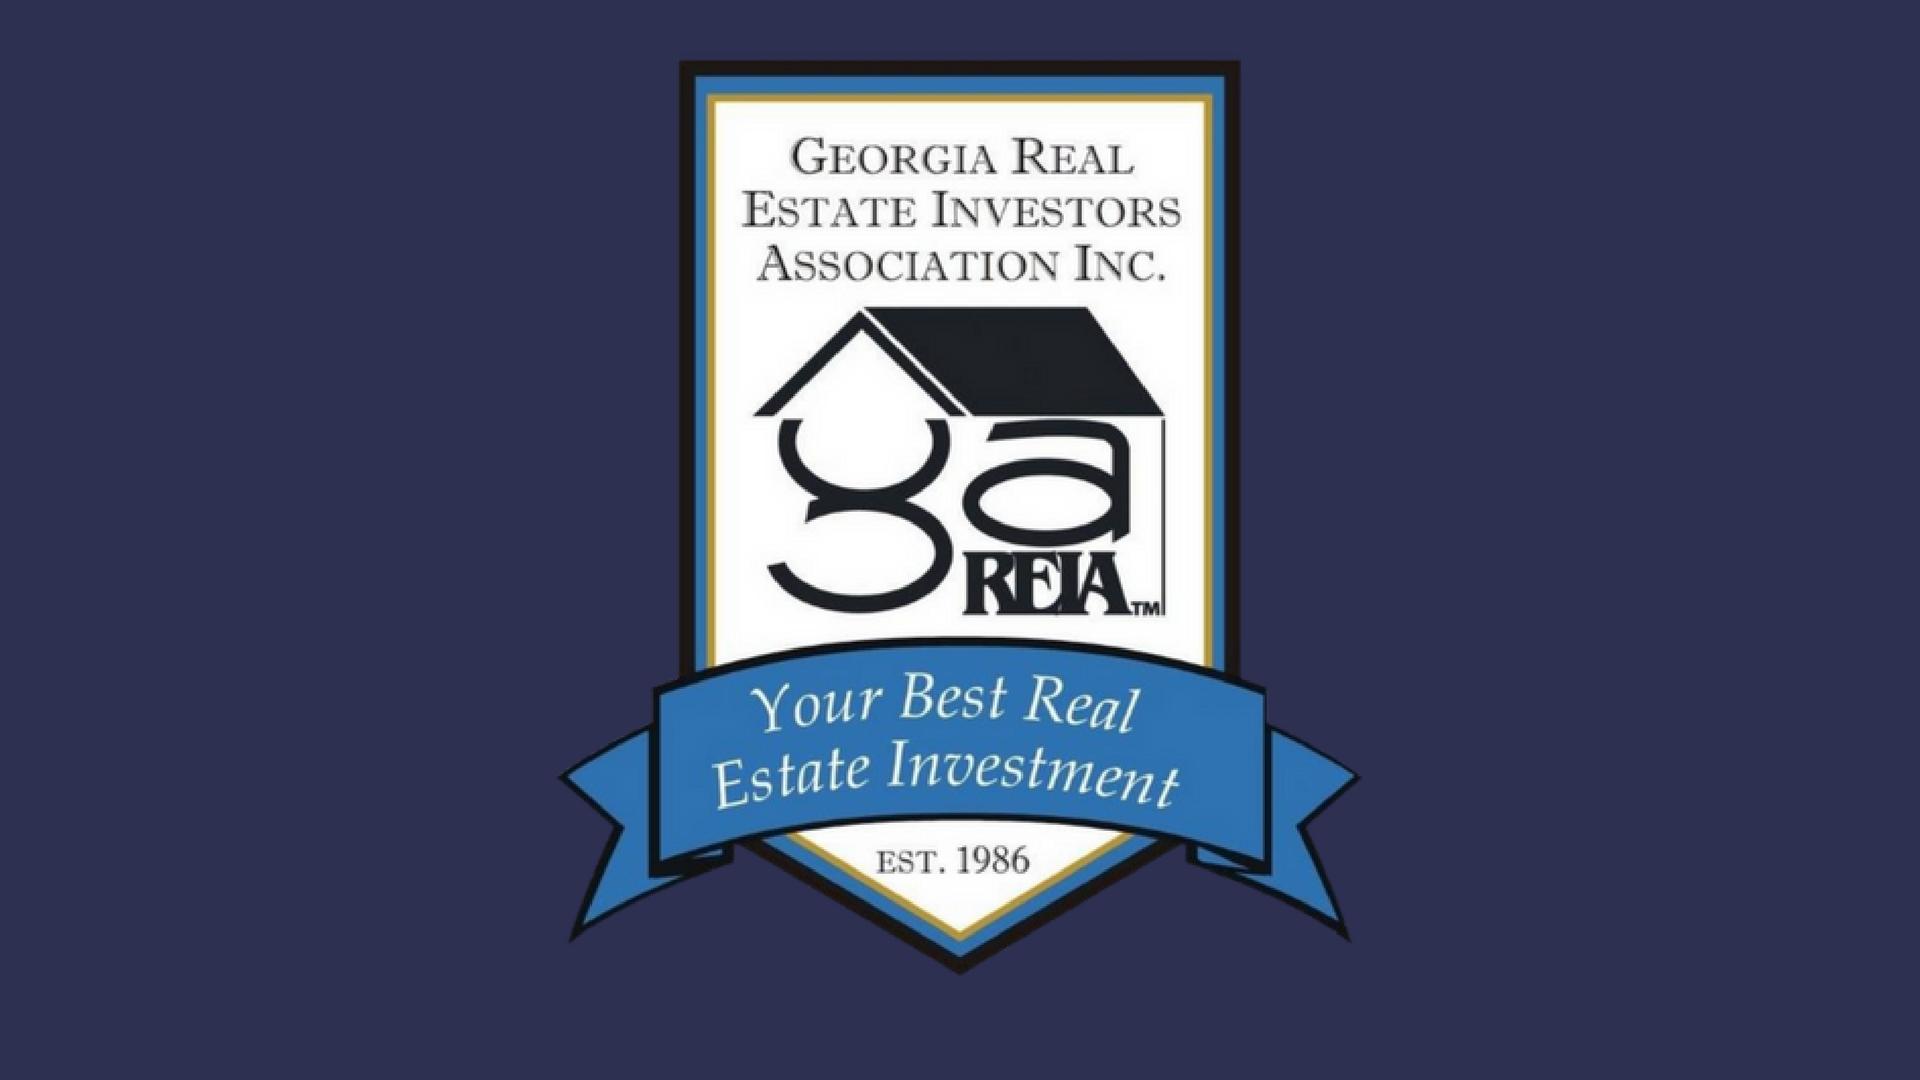 A Plus Real Estate Flippers & Rehabbers Network Atlanta